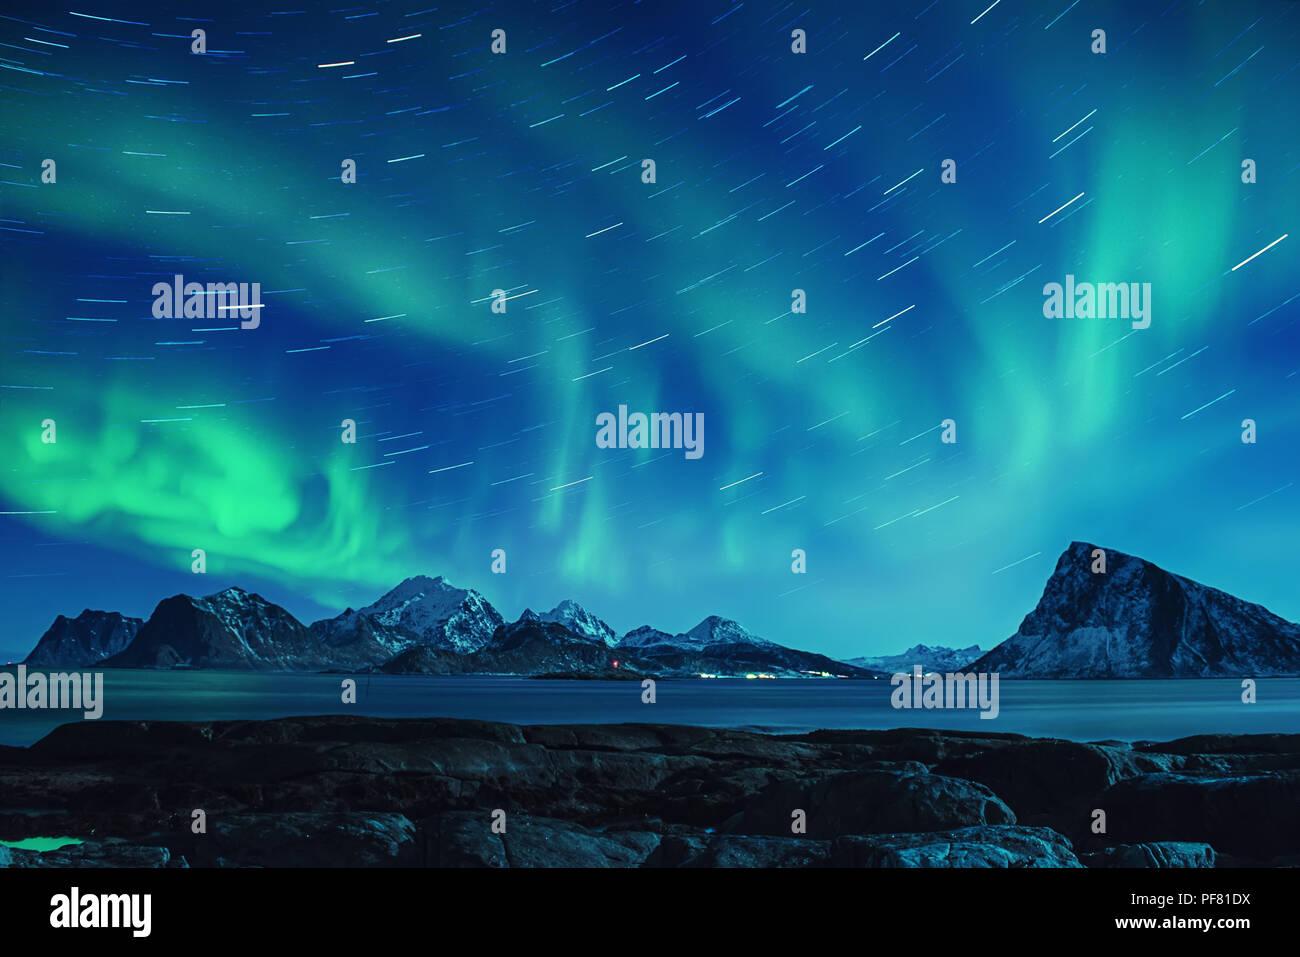 Luci del nord in Norvegia Immagini Stock